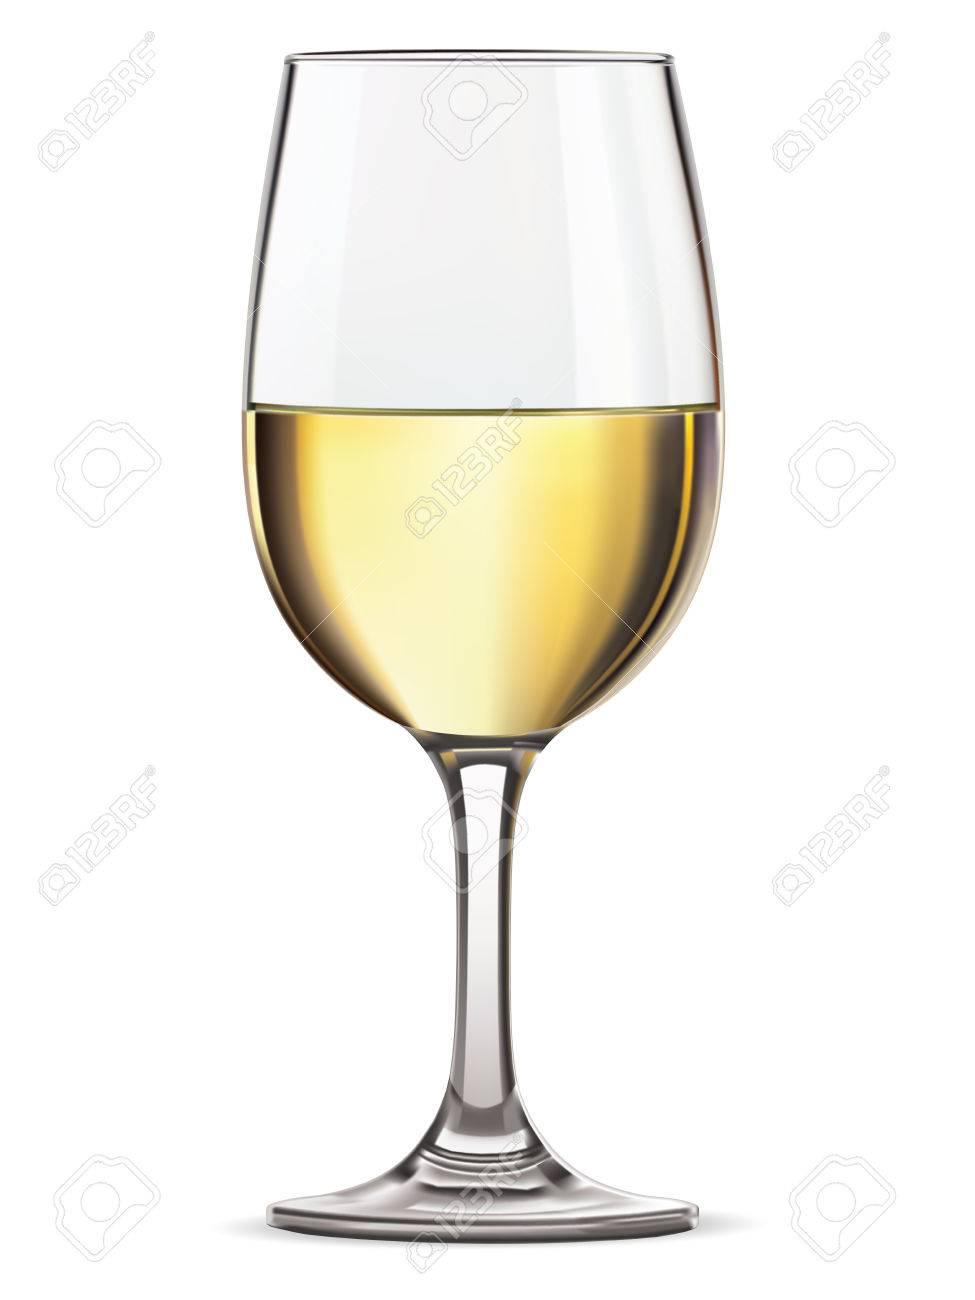 Glass of white wine, isolated illustration - 36487886